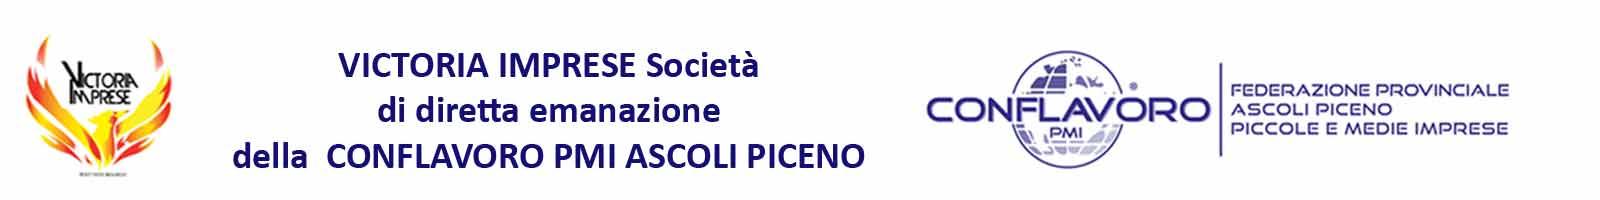 logo-Victoria-imprese-PMI-c